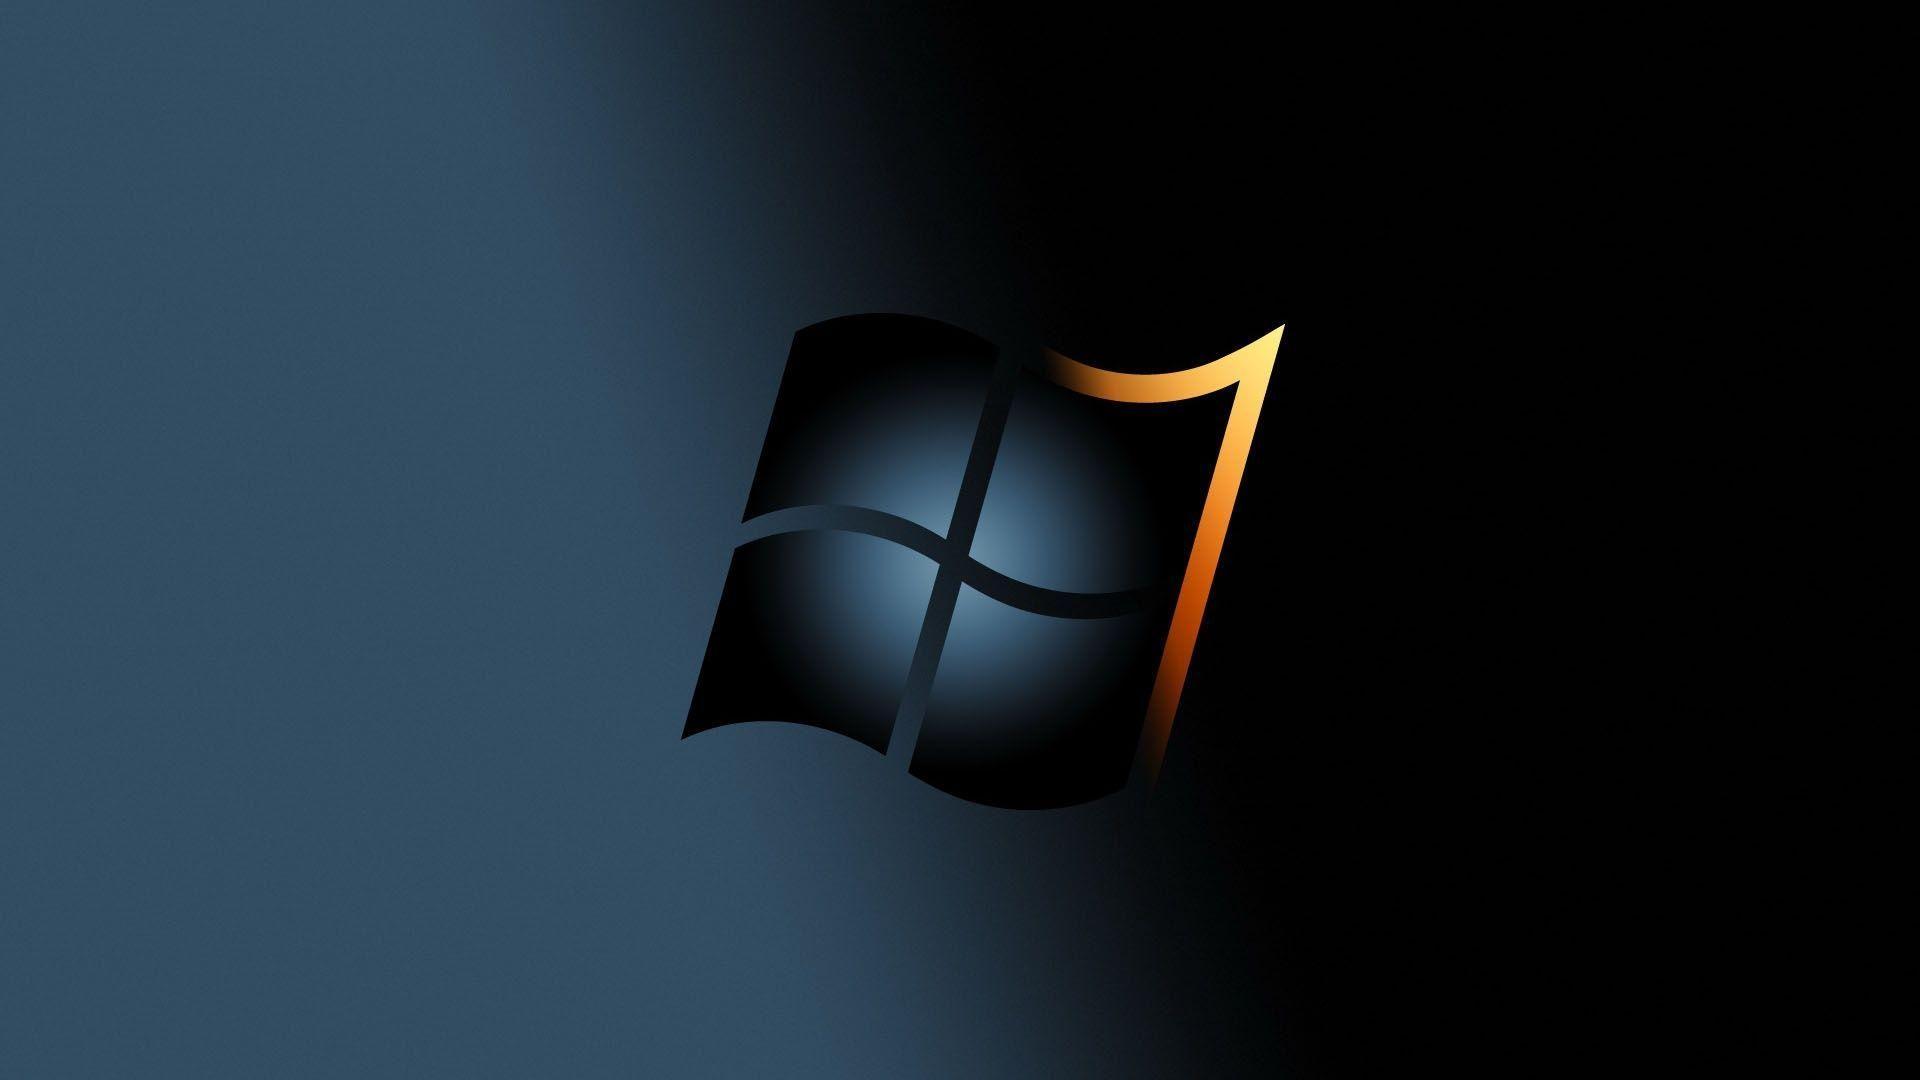 Windows 7 71 Hd Wallpaper 1366x768 Wasemplof 壁紙 デスクトップ テクノロジー 壁紙 デスクトップの背景